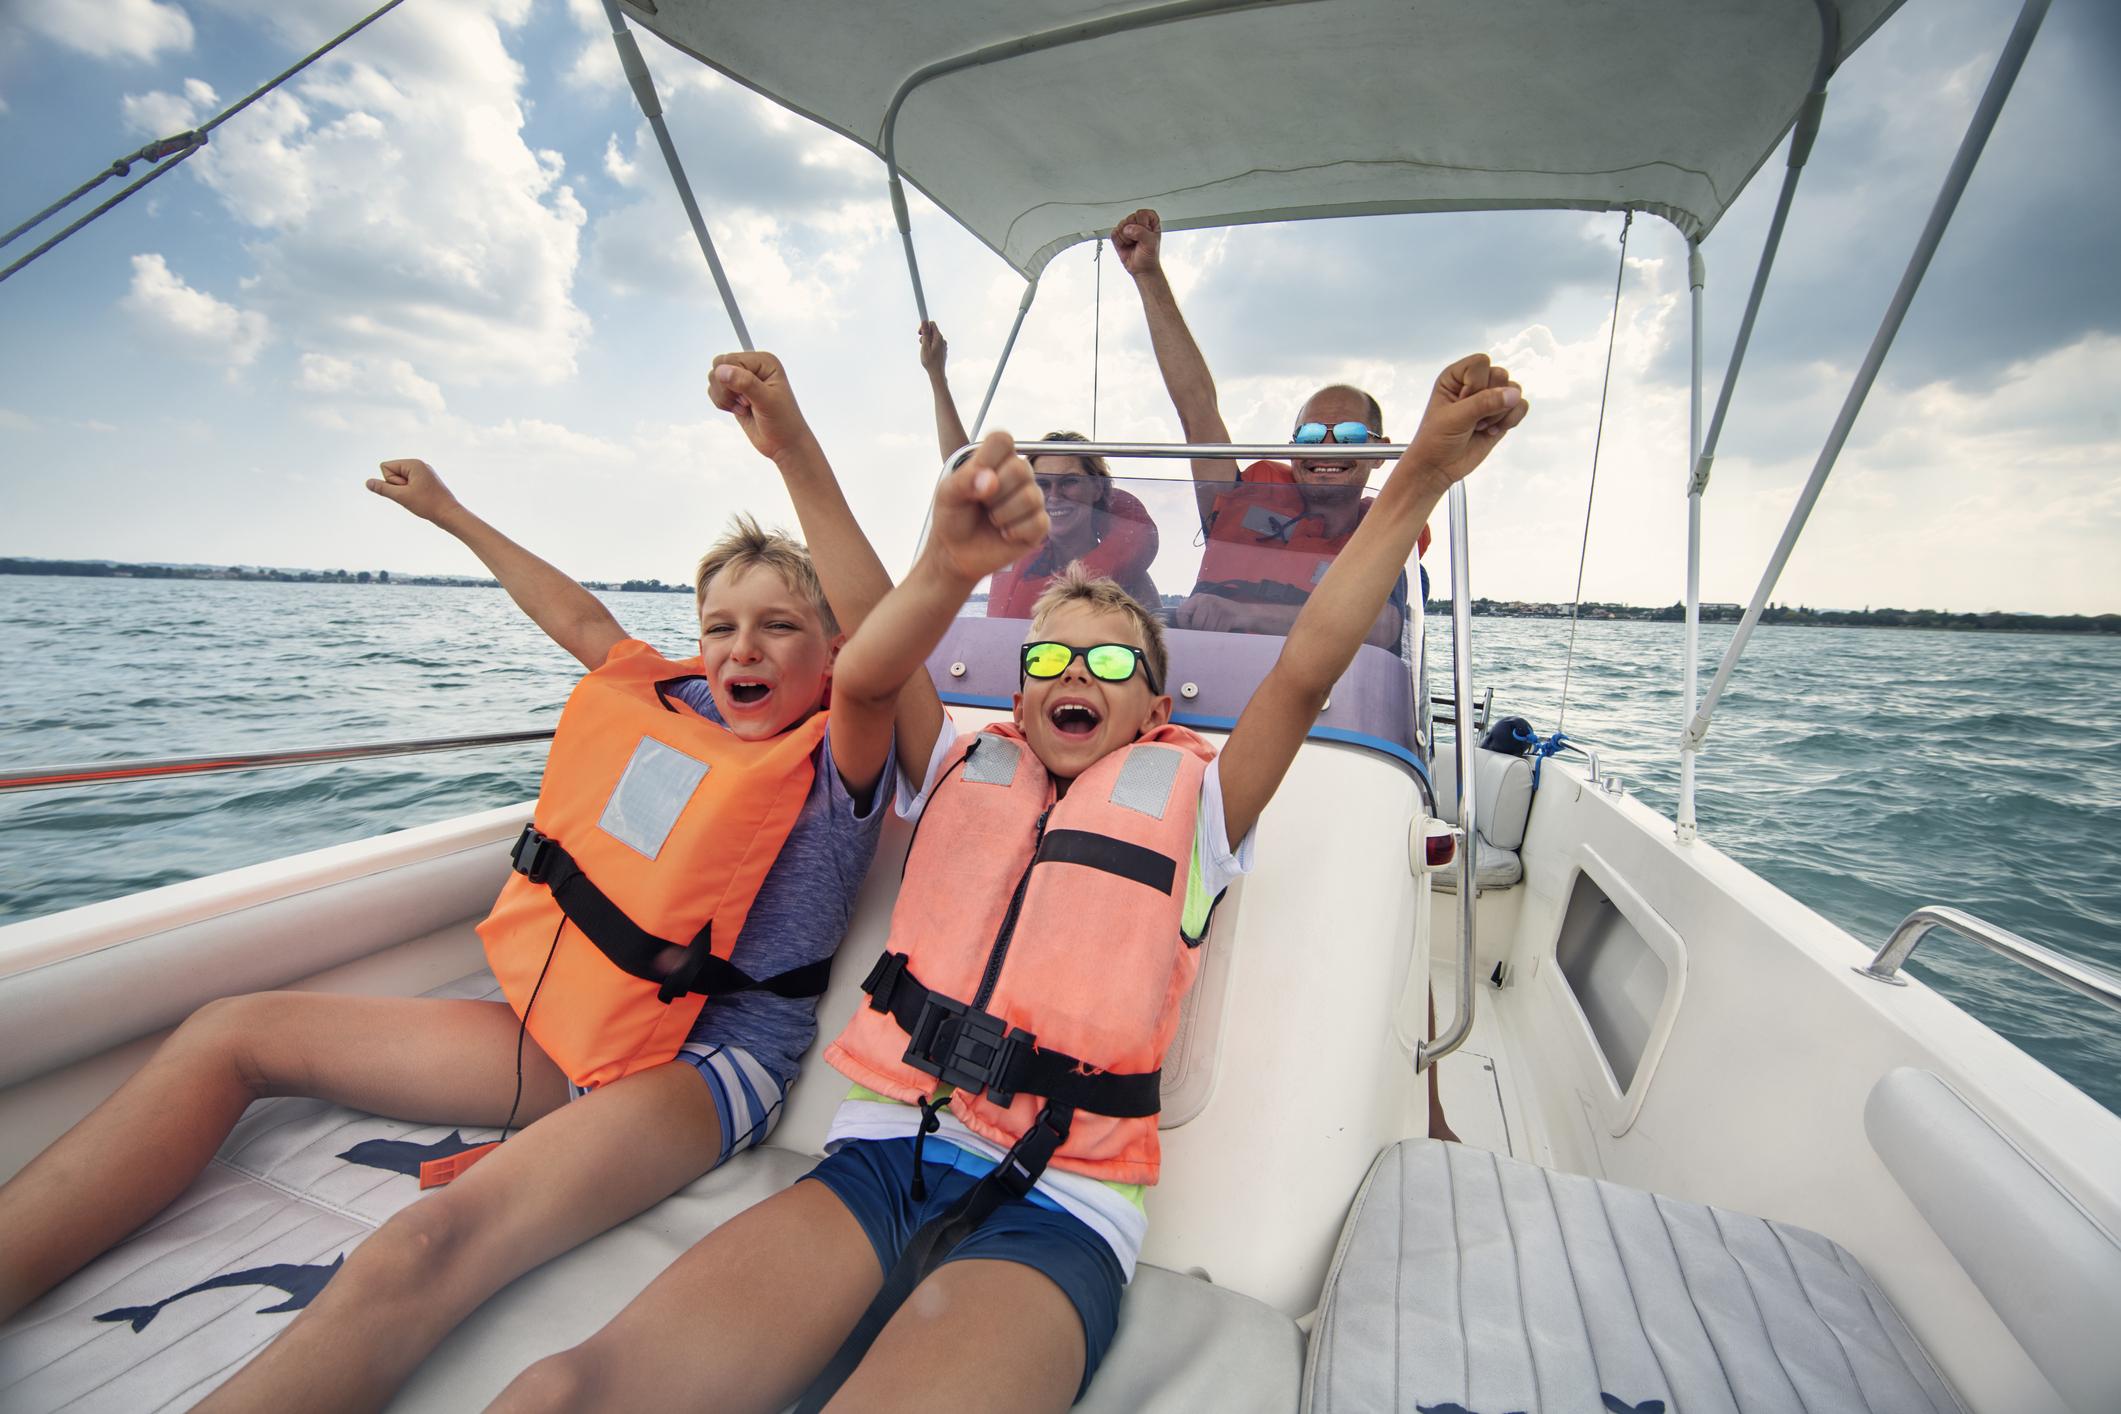 Family enjoying Garda Lake vacations. Parents and kids riding a boat on Lake Garda. Nikon D850